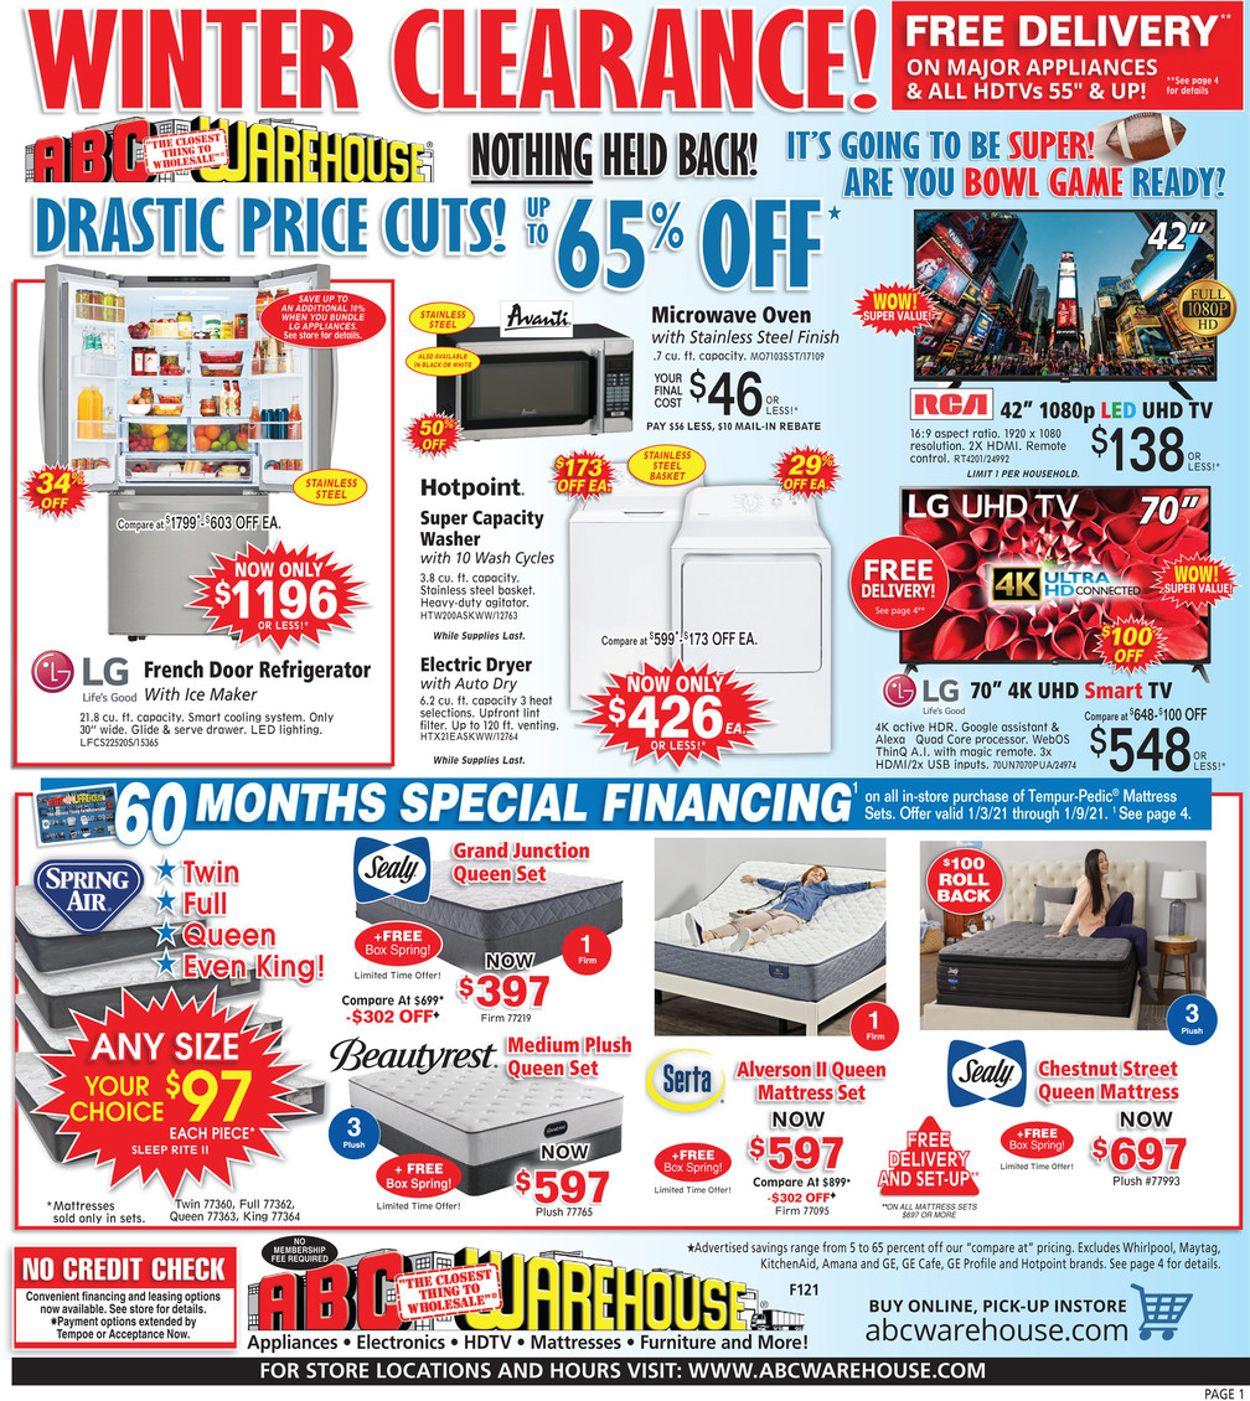 ABC Warehouse Winter Clearance 2021 Weekly Ad Circular - valid 01/03-01/09/2021